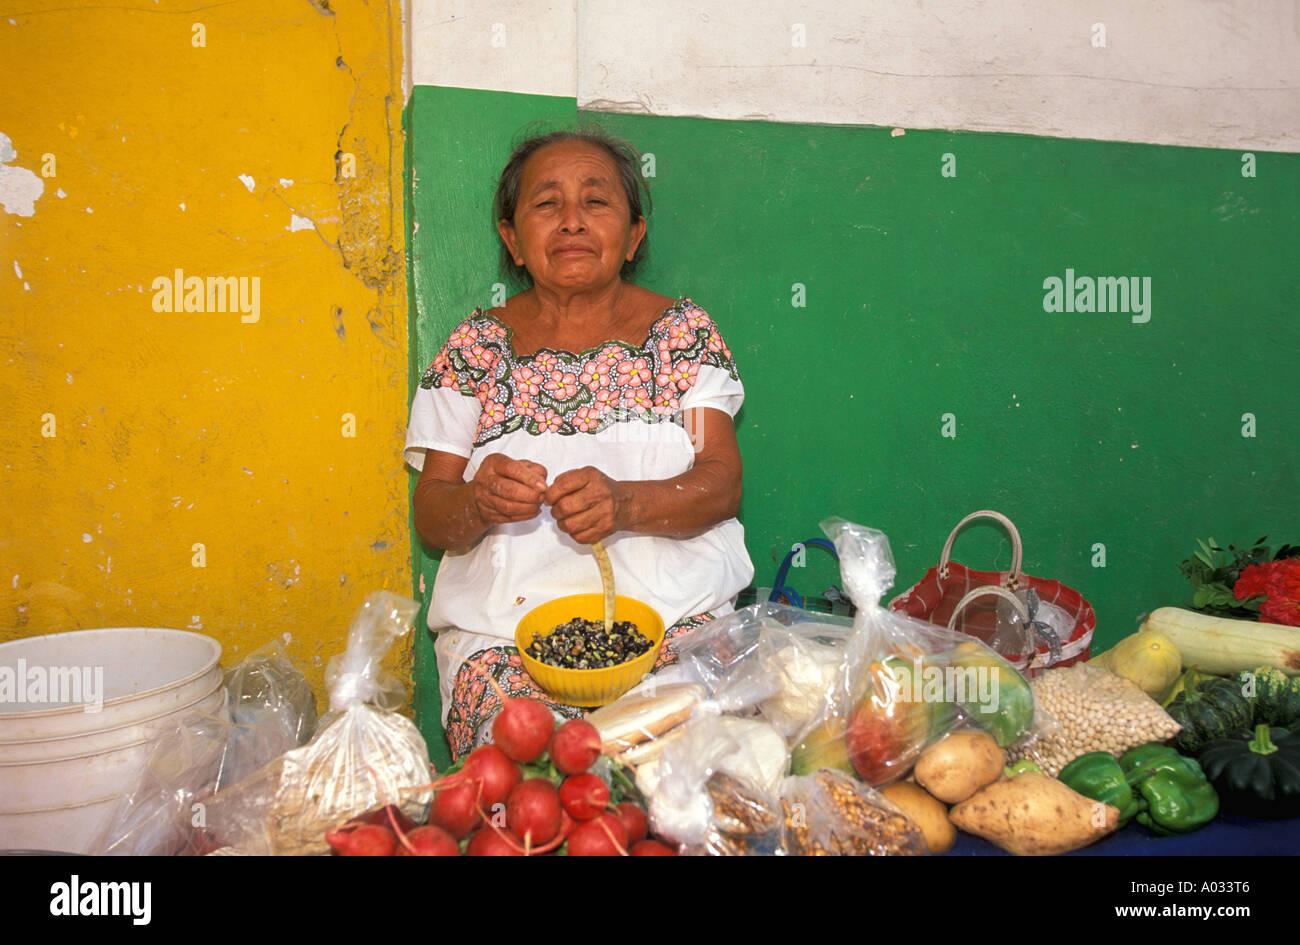 Mexico maya woman at market mayan produce vegetables tomatoes yucatan colorful wall colorful costume traditional dress - Stock Image